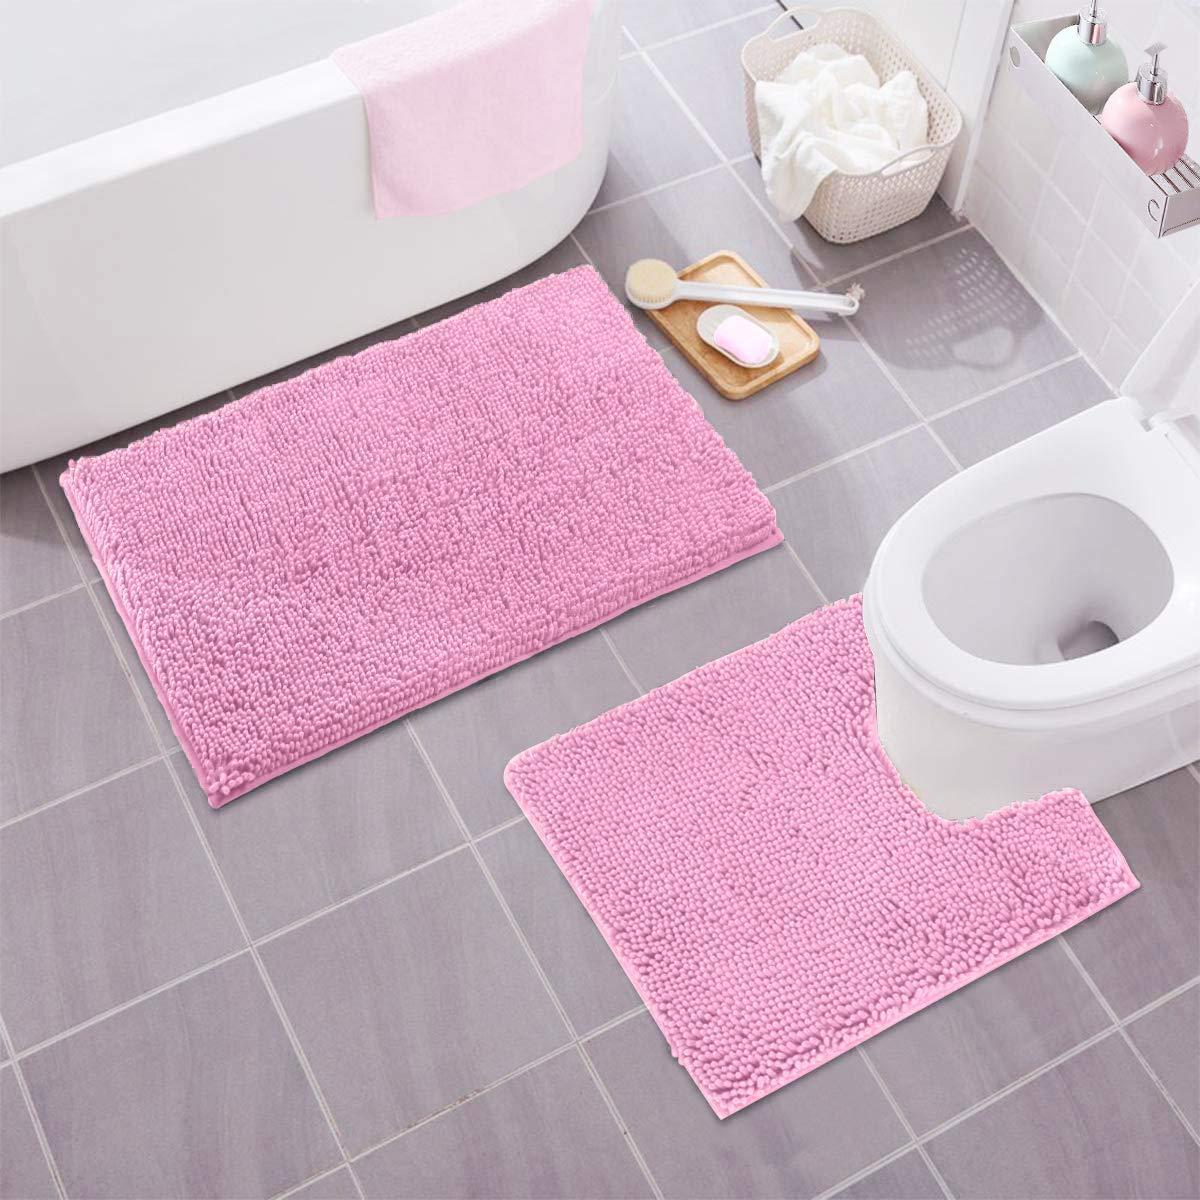 Pink Bathroom Accessories Pink Bathroom Accessories Pink Bathroom Decor Pink Bath Rug [ 1100 x 1100 Pixel ]